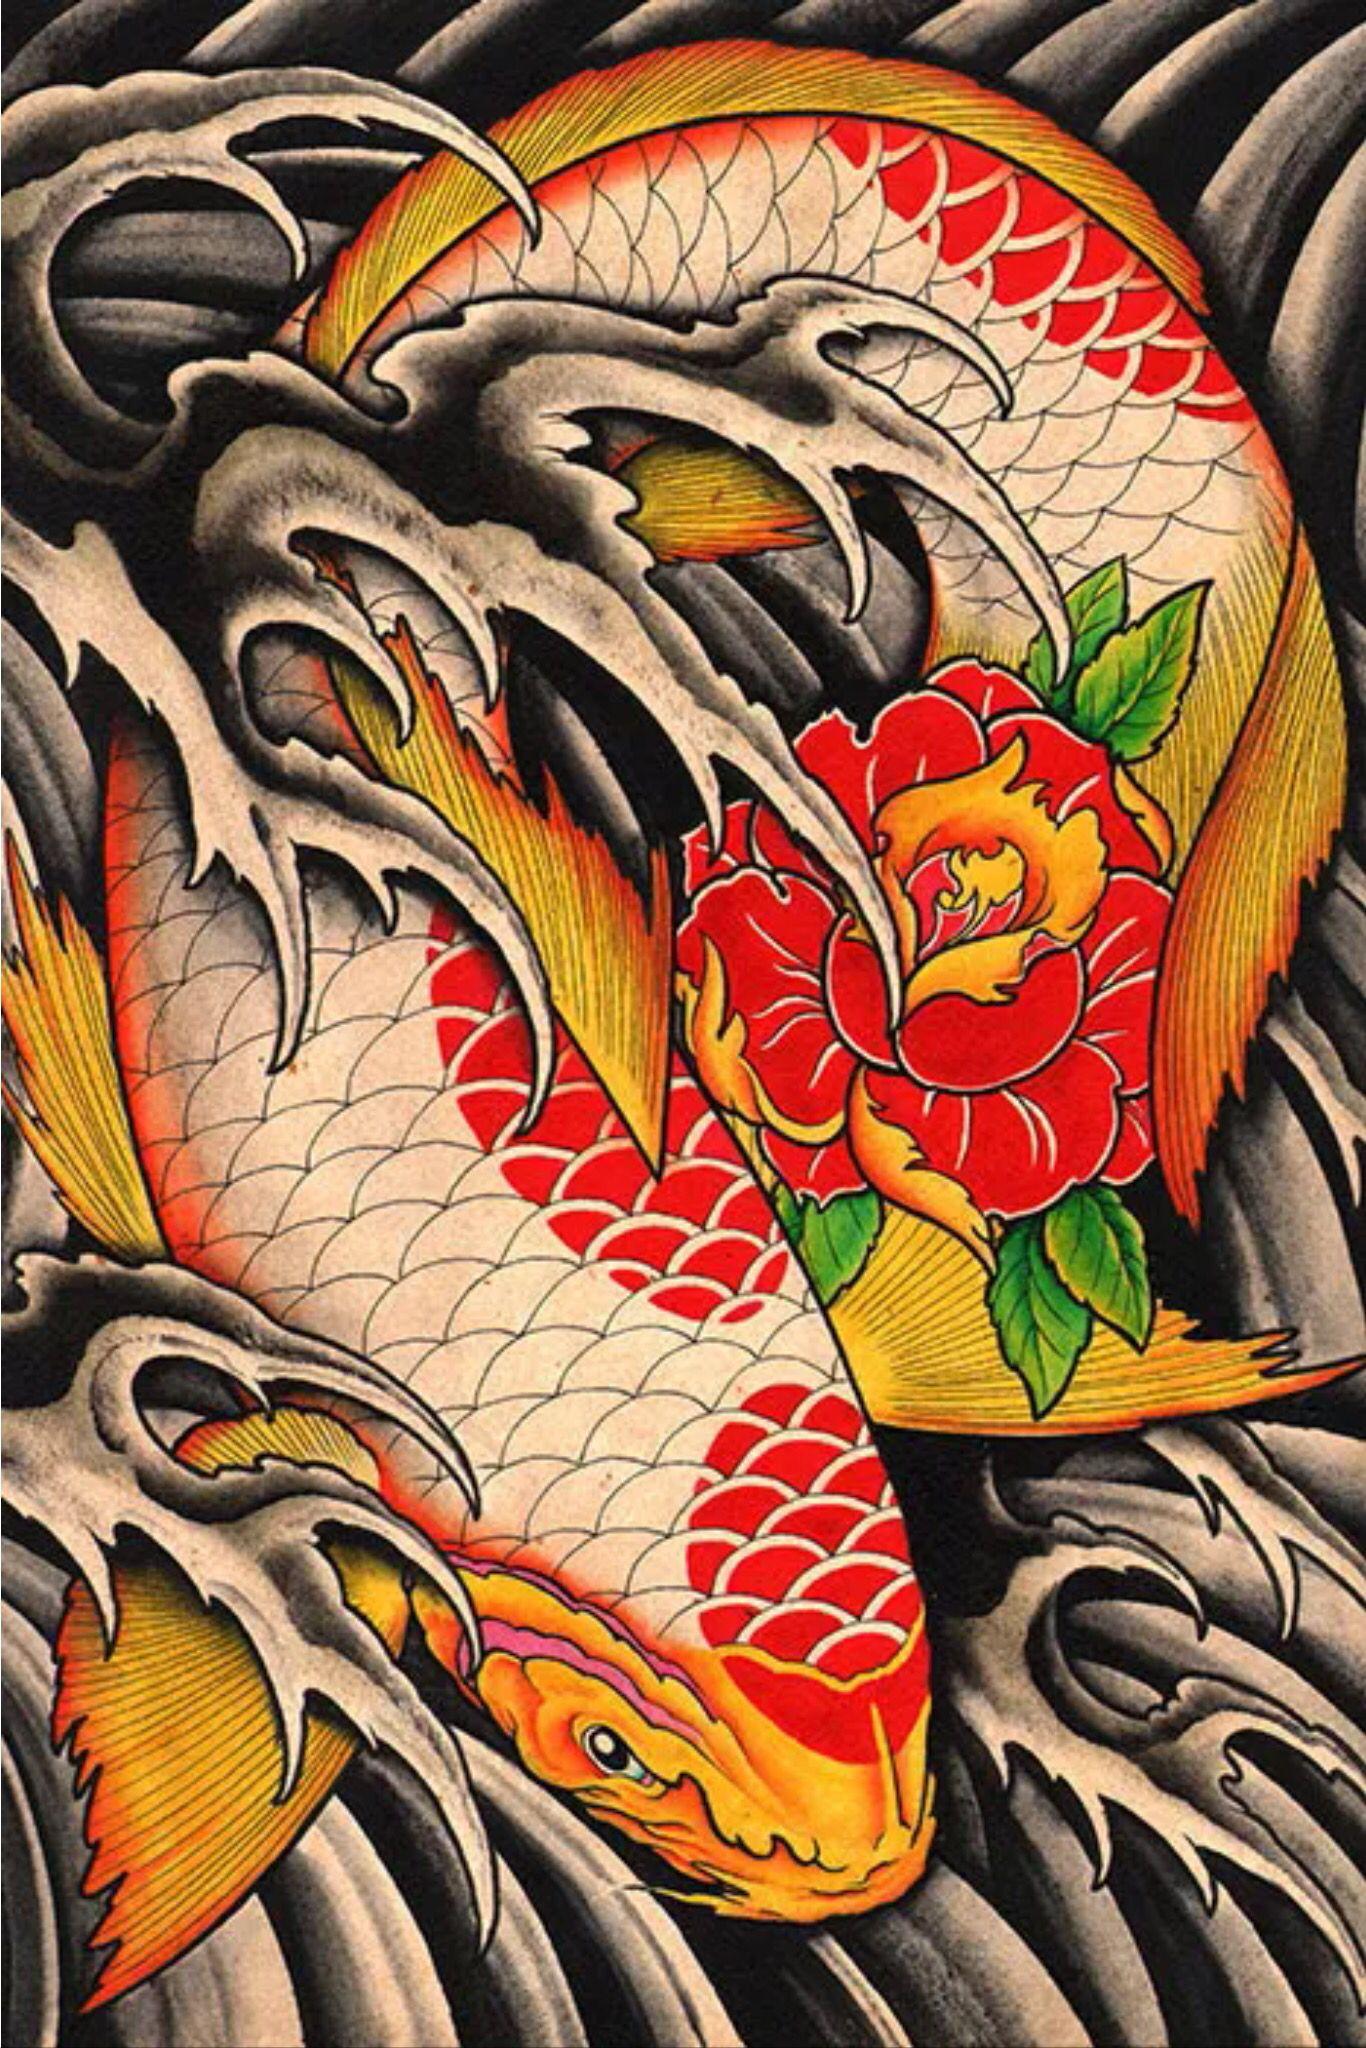 Awesome coy. Maybe a nice tatt option | Koi Fish | Pinterest | Tatt